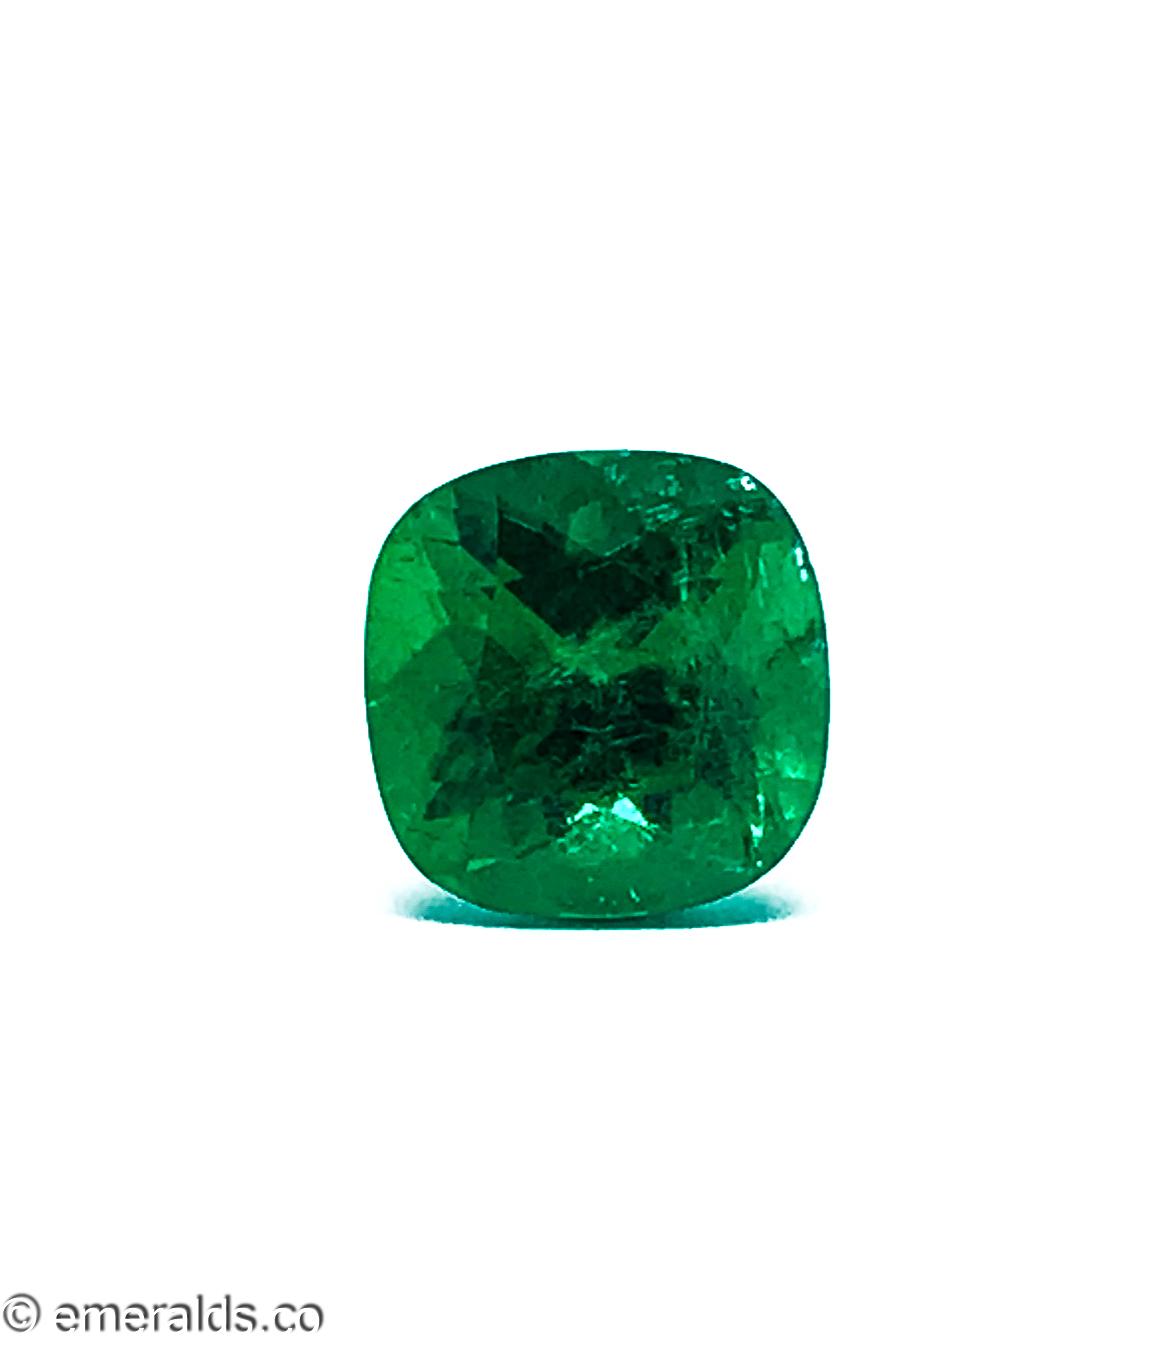 3.18 Fine Colombian Emerald Cushion No Oil Agl/gubelin